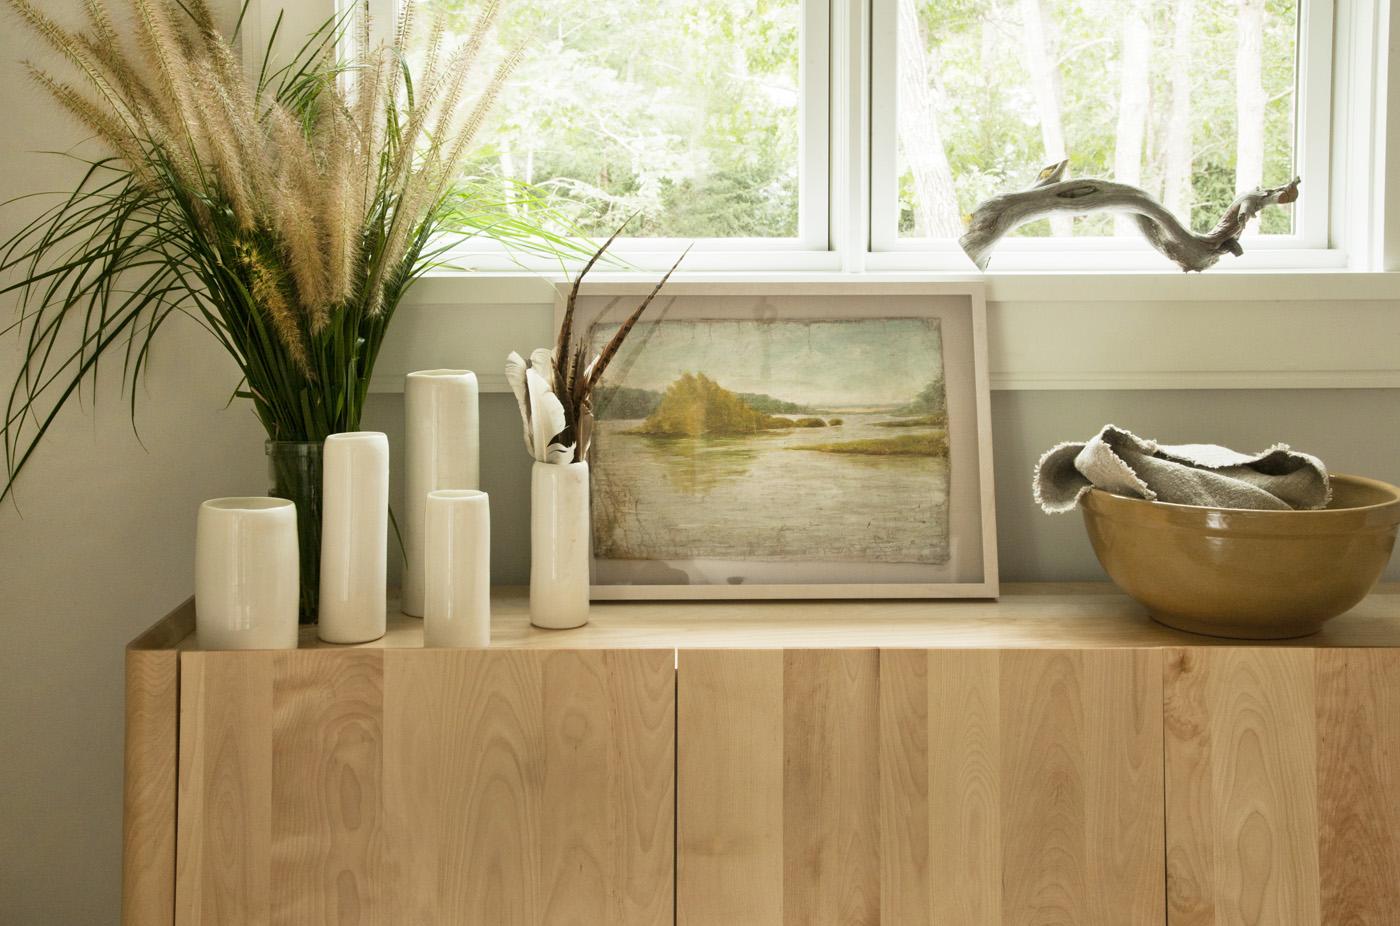 Farrin_West_Hamptons_Interior_Design_East_Hampton_Traditional_007.jpg